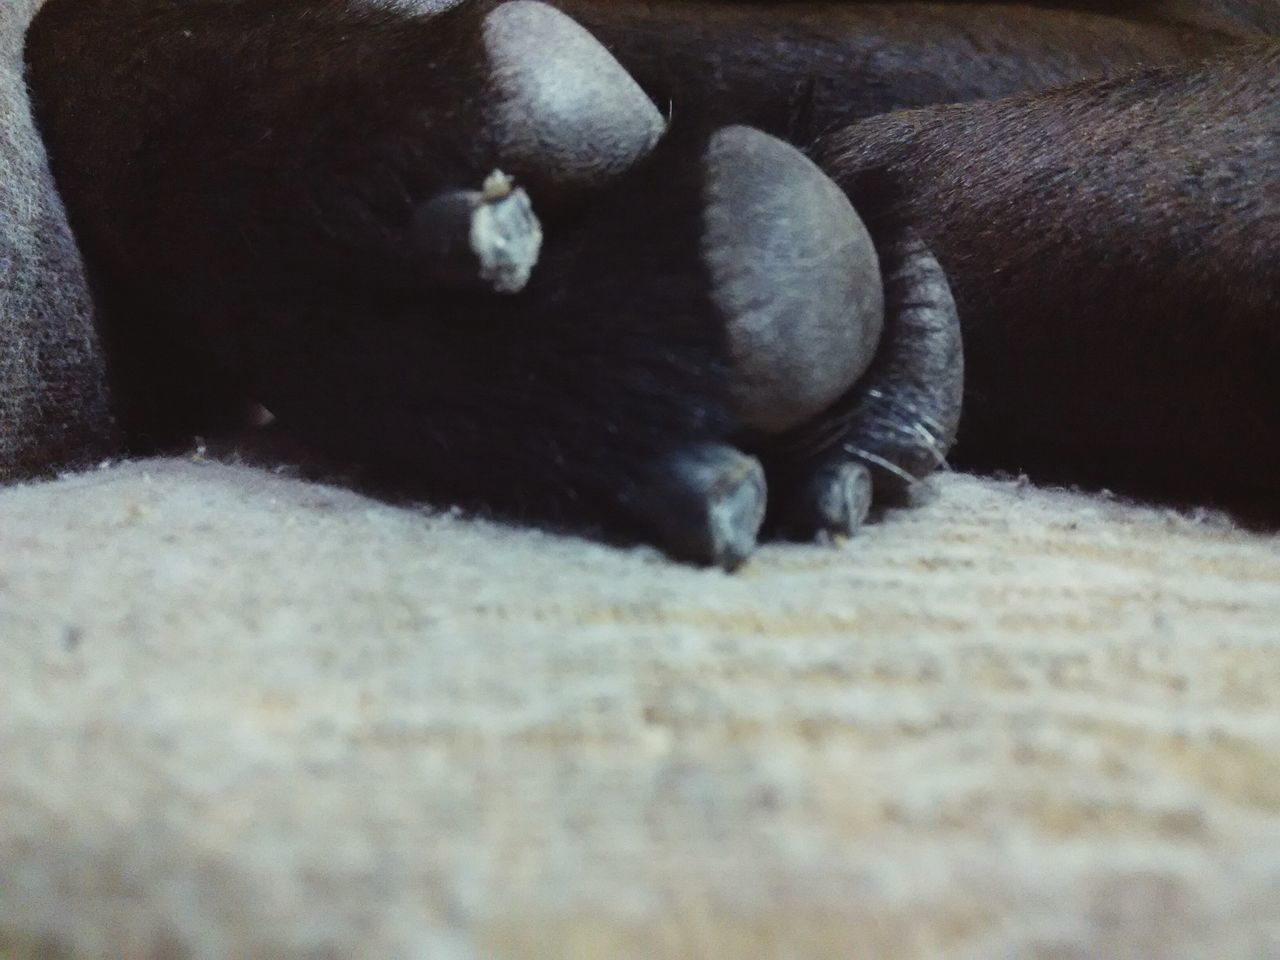 Dogs Dog Love Dog❤ Dogslife Doggy Love Dog Lover Dog Photography Dogs Of EyeEm Doglovers Dog Sleeping  EyeEmNewHere